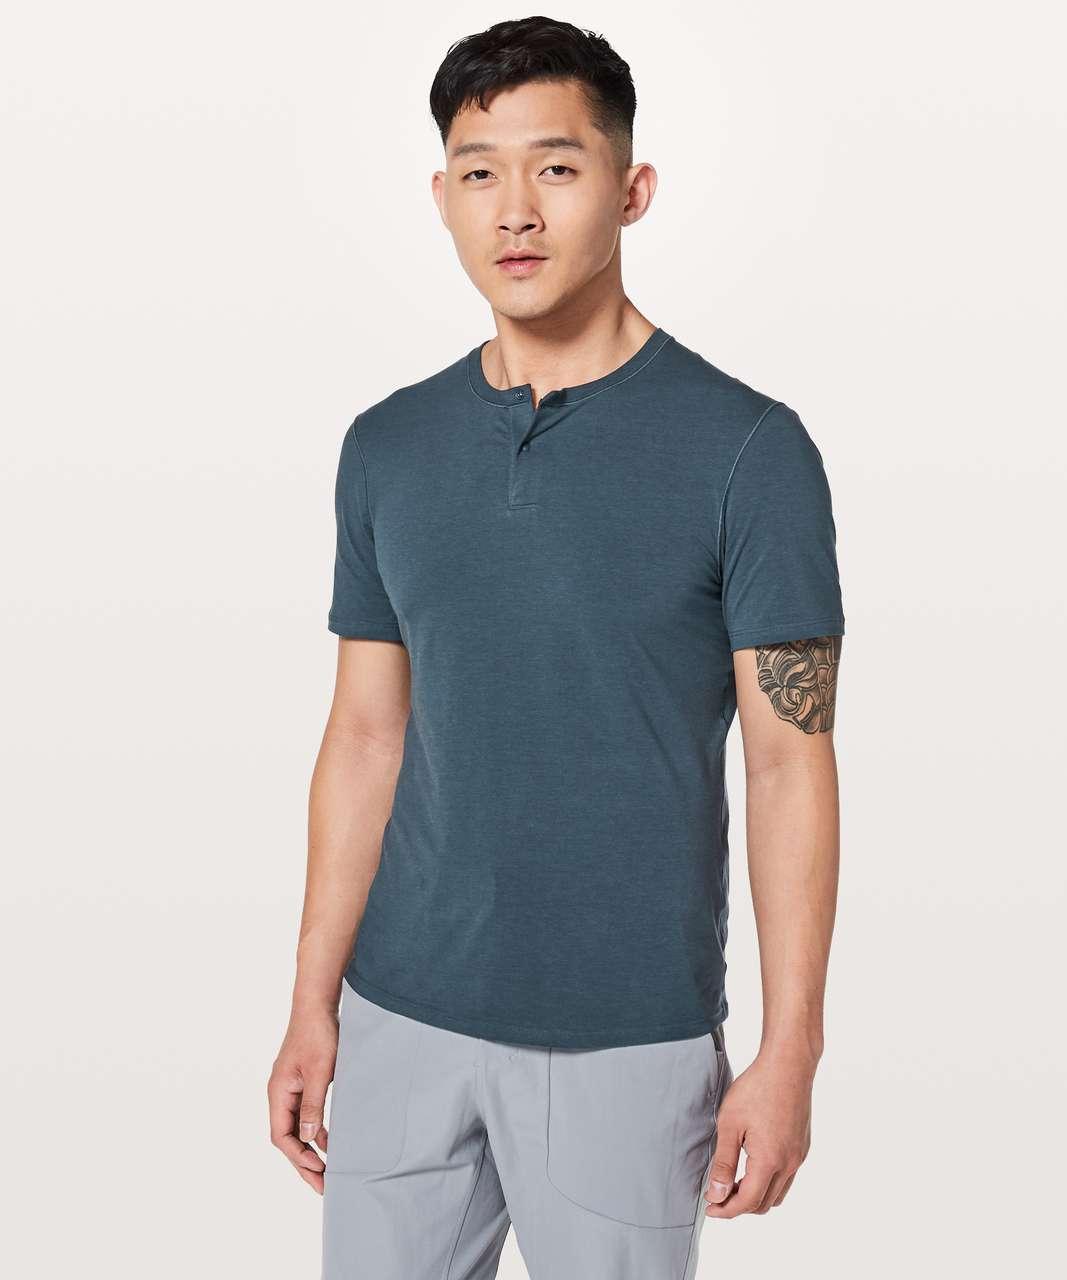 Lululemon 5 Year Basic Short Sleeve Henley - Mach Blue